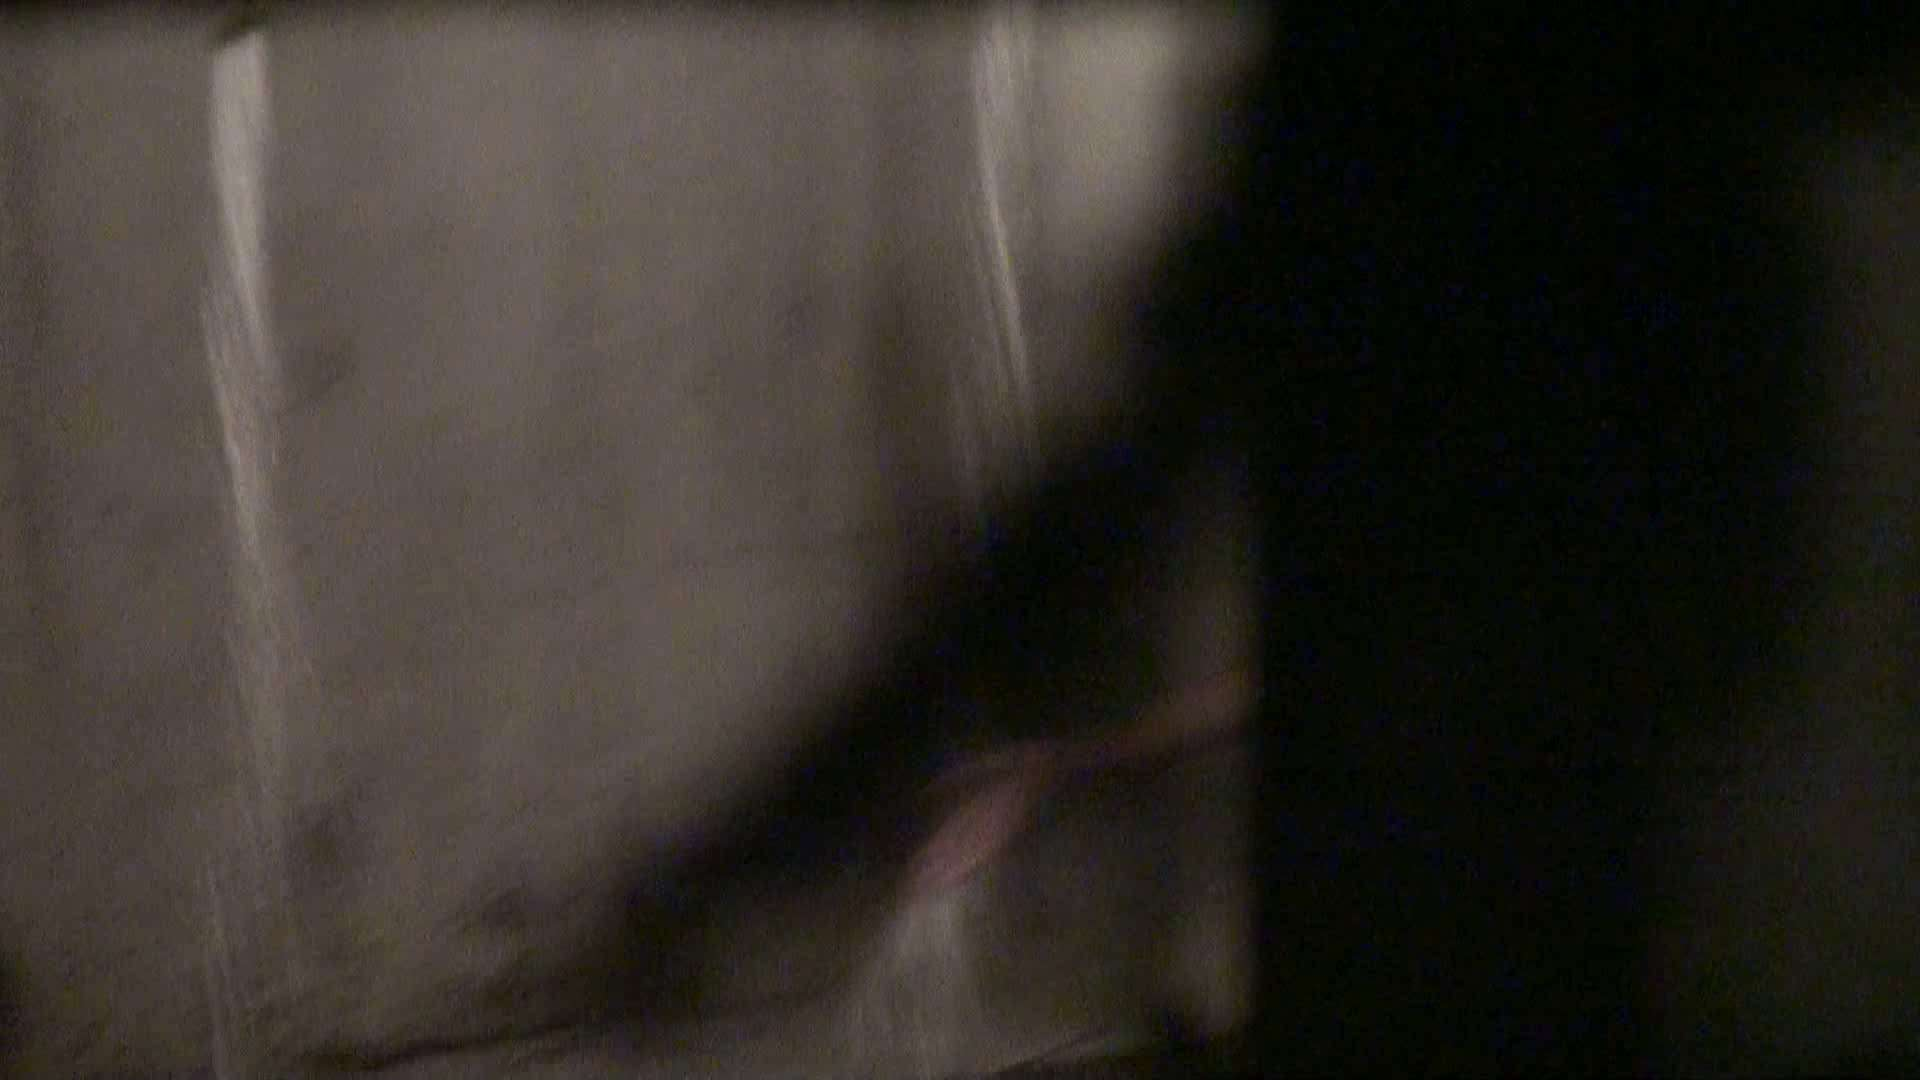 Aquaな露天風呂Vol.356 ガールの盗撮 セックス無修正動画無料 75枚